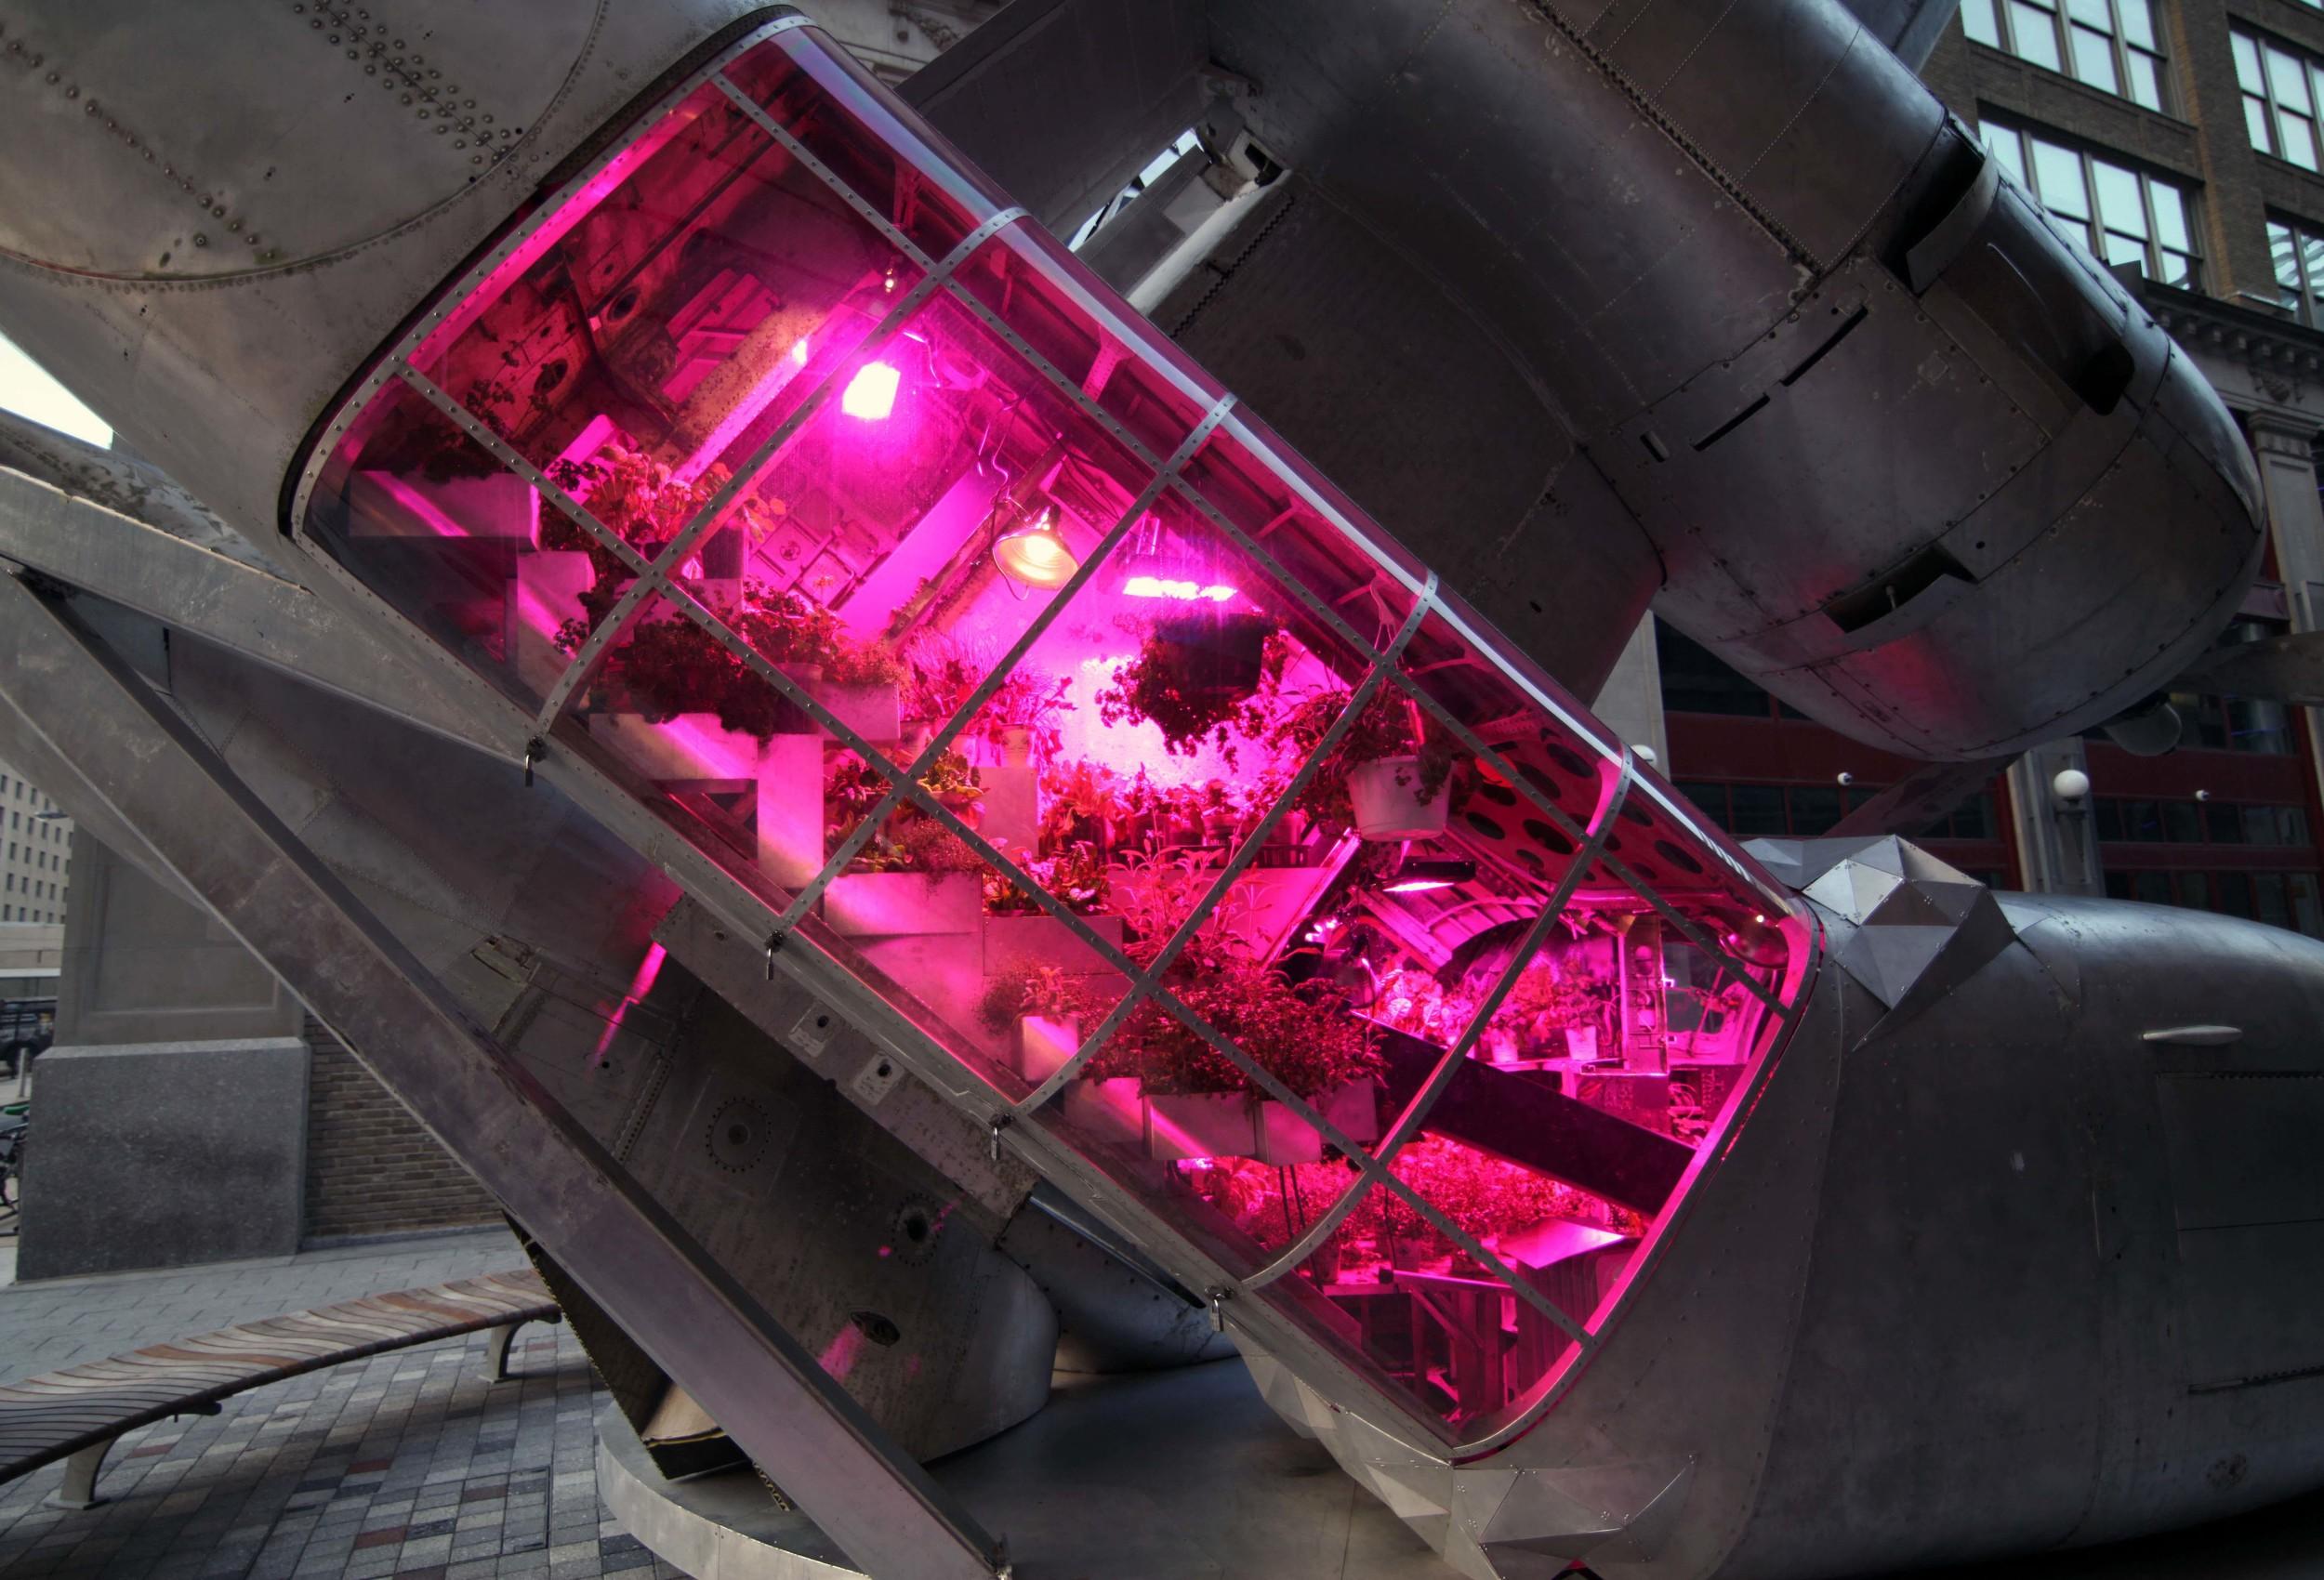 Grumman Greenhouse, 2011, Grumman S2f Cold War Era submarine tracking torpedo bomber, solar panels, edible vegetables and herbs, 30' tall 18' wide 20' deep.